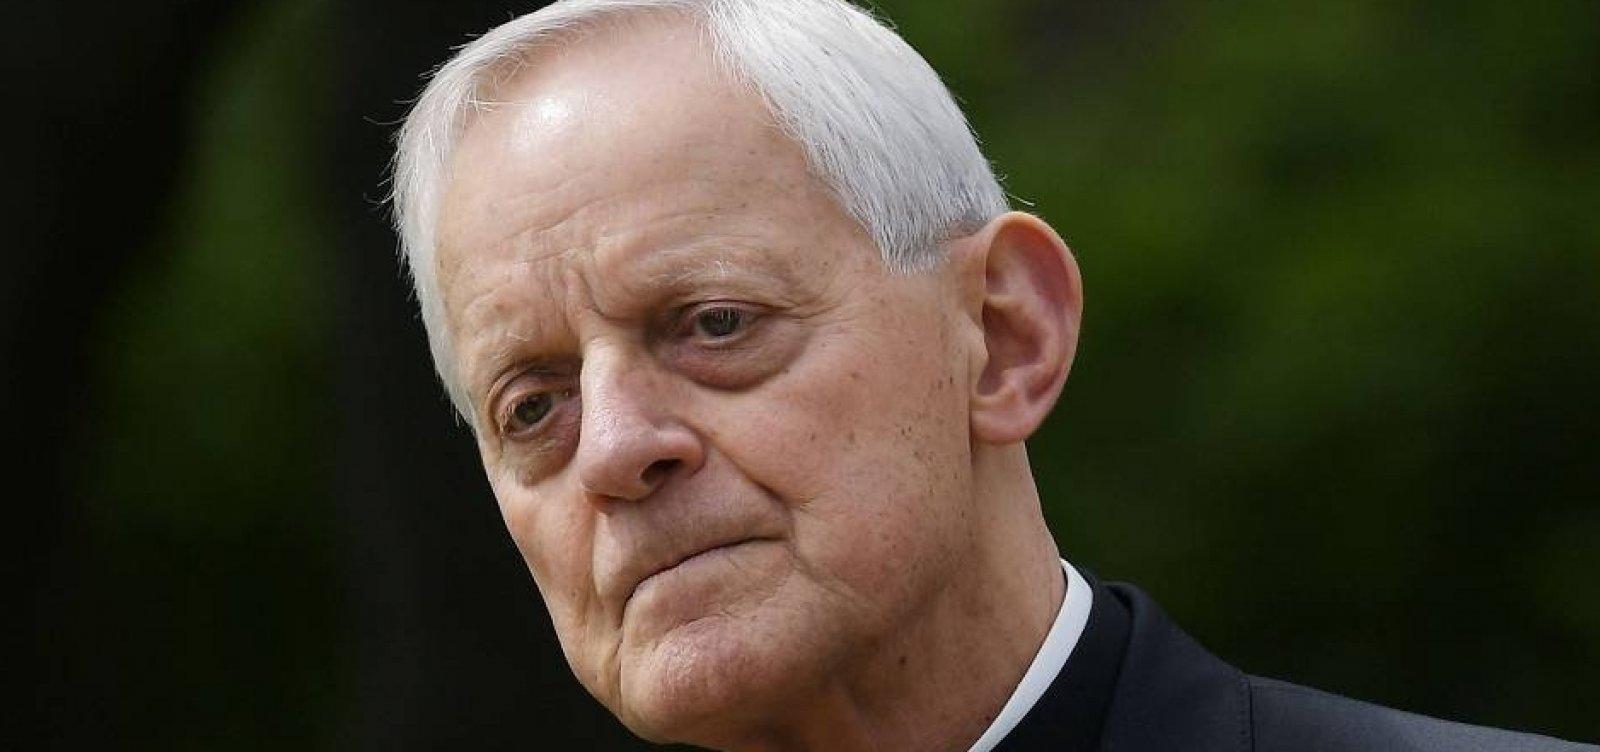 Papa aceita renúncia de arcebispo acusado de encobrir casos de pedofilia